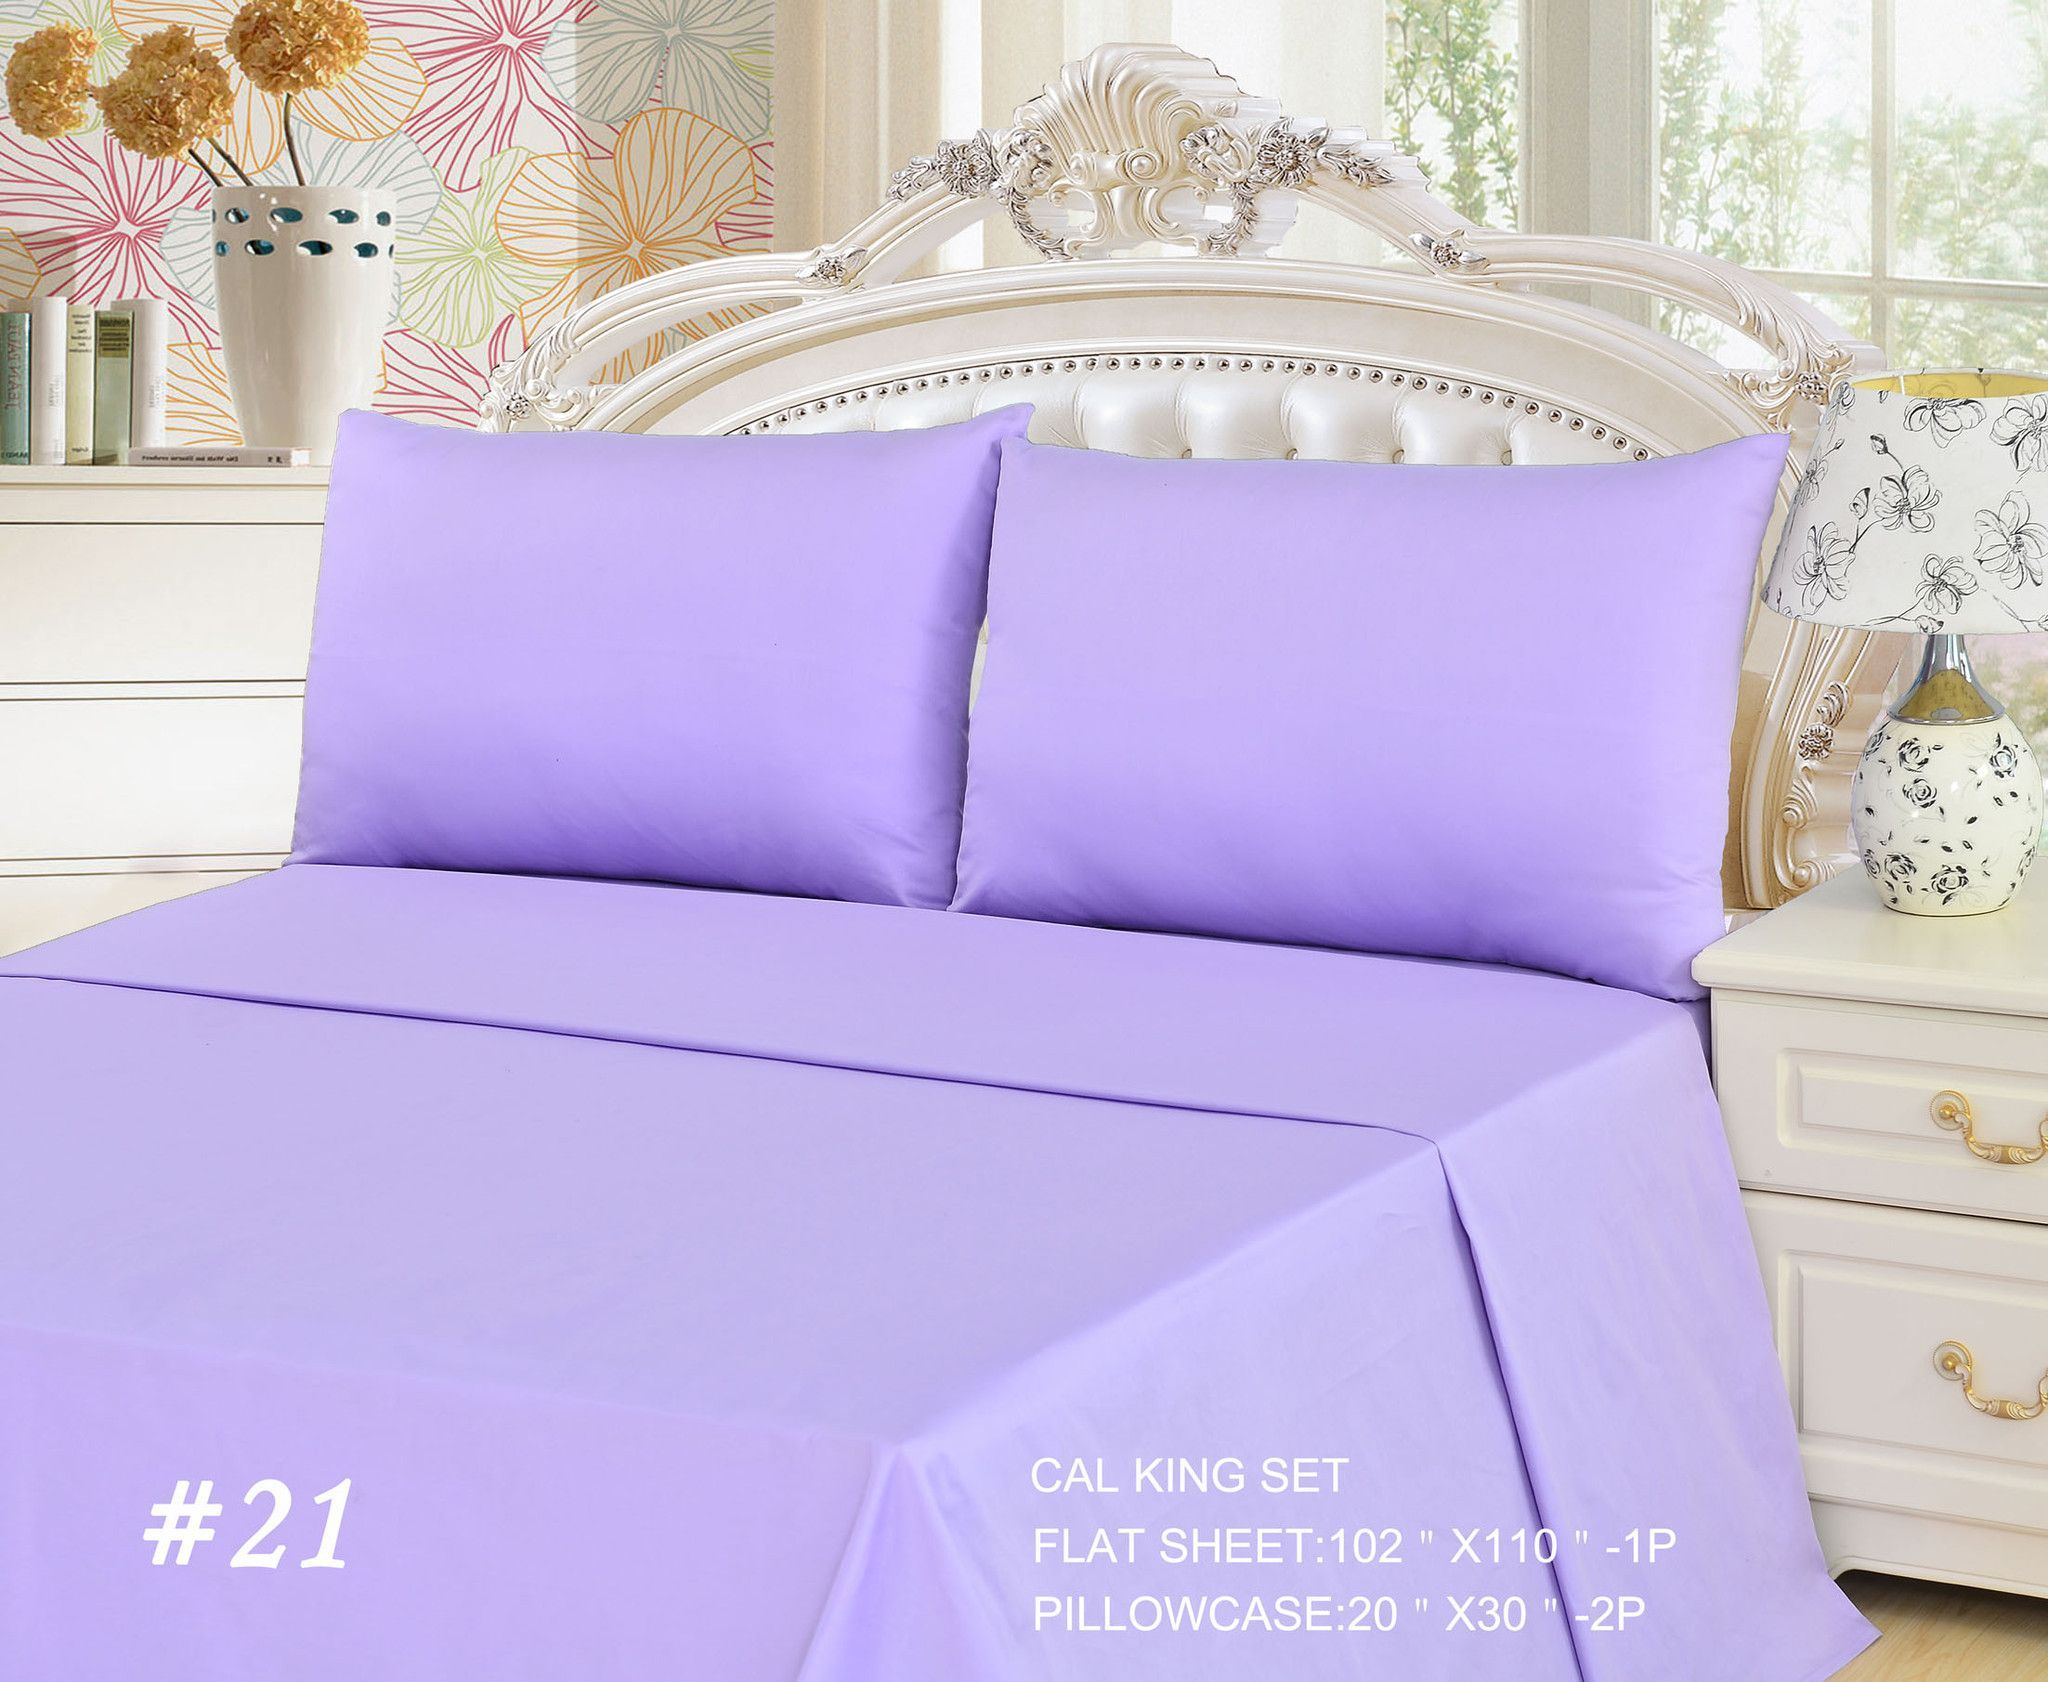 Exceptional Tache 3 Piece Lavender Dreams Light Purple Bed Sheet Set (California King)  (Flat